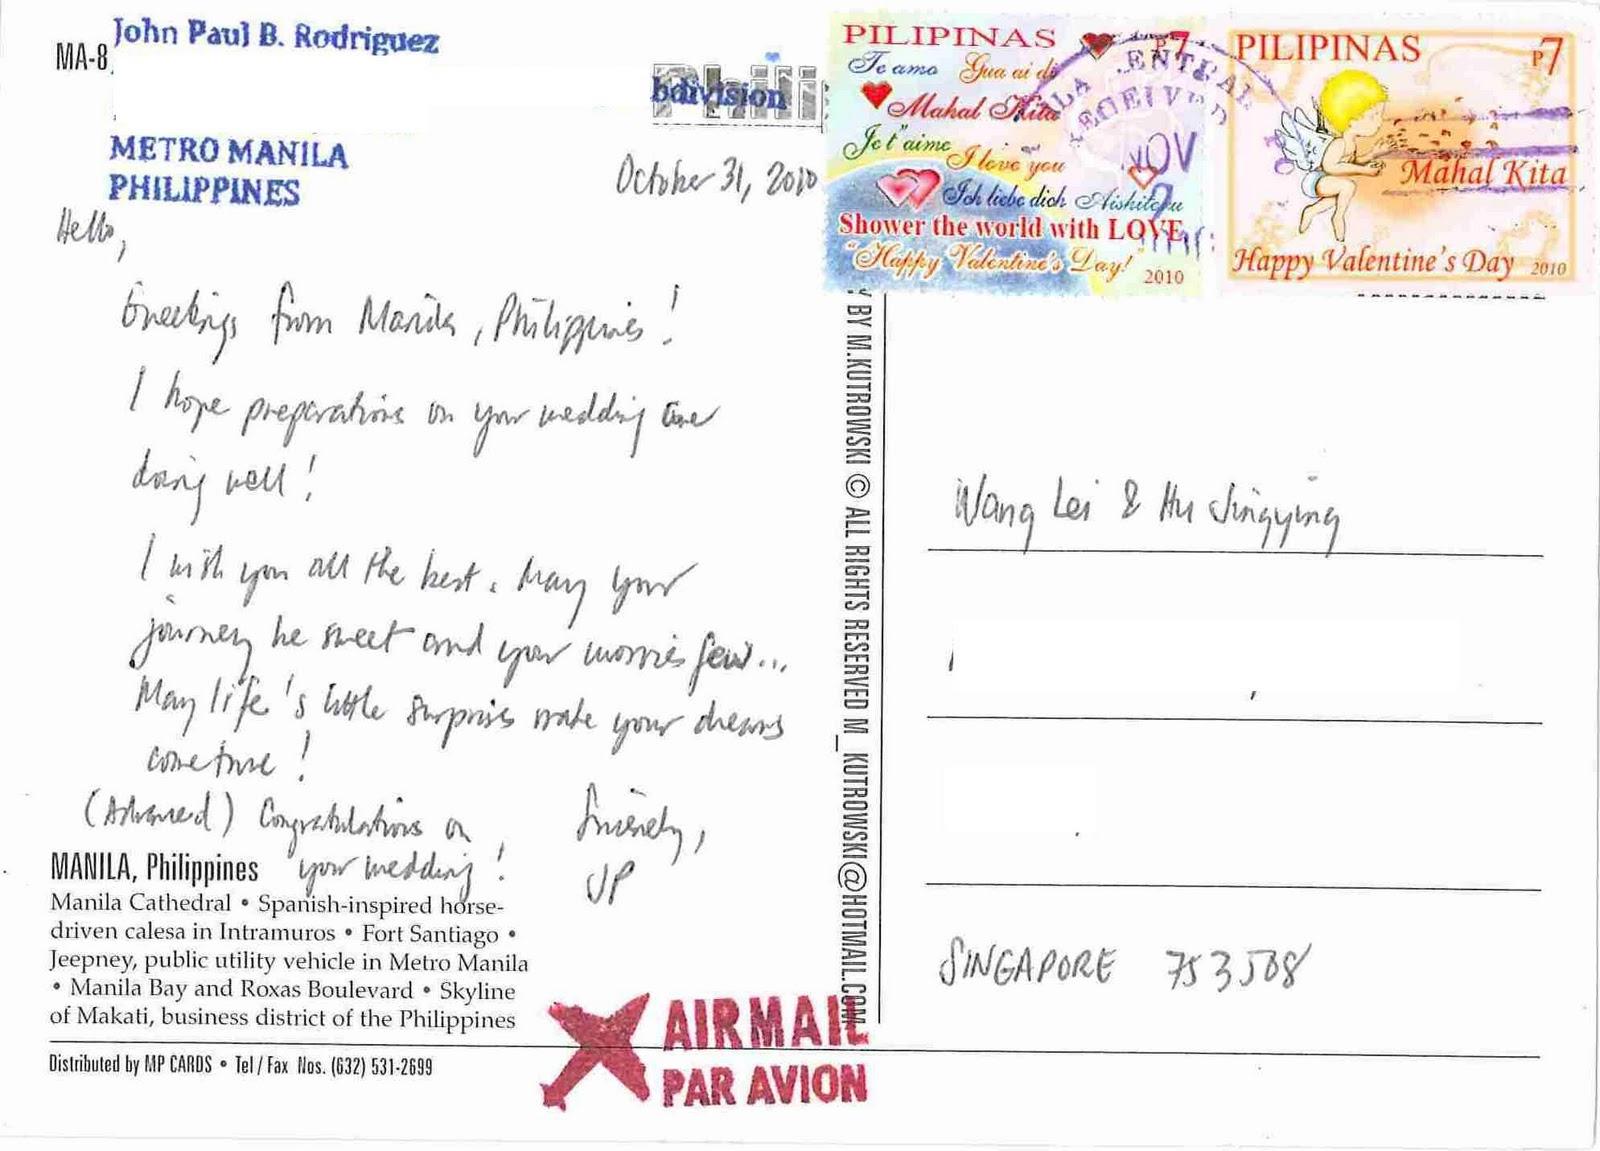 Wls philatelic world my 13th wedding postcard received on 2010 my 13th wedding postcard received on 20101109 from philippines altavistaventures Image collections